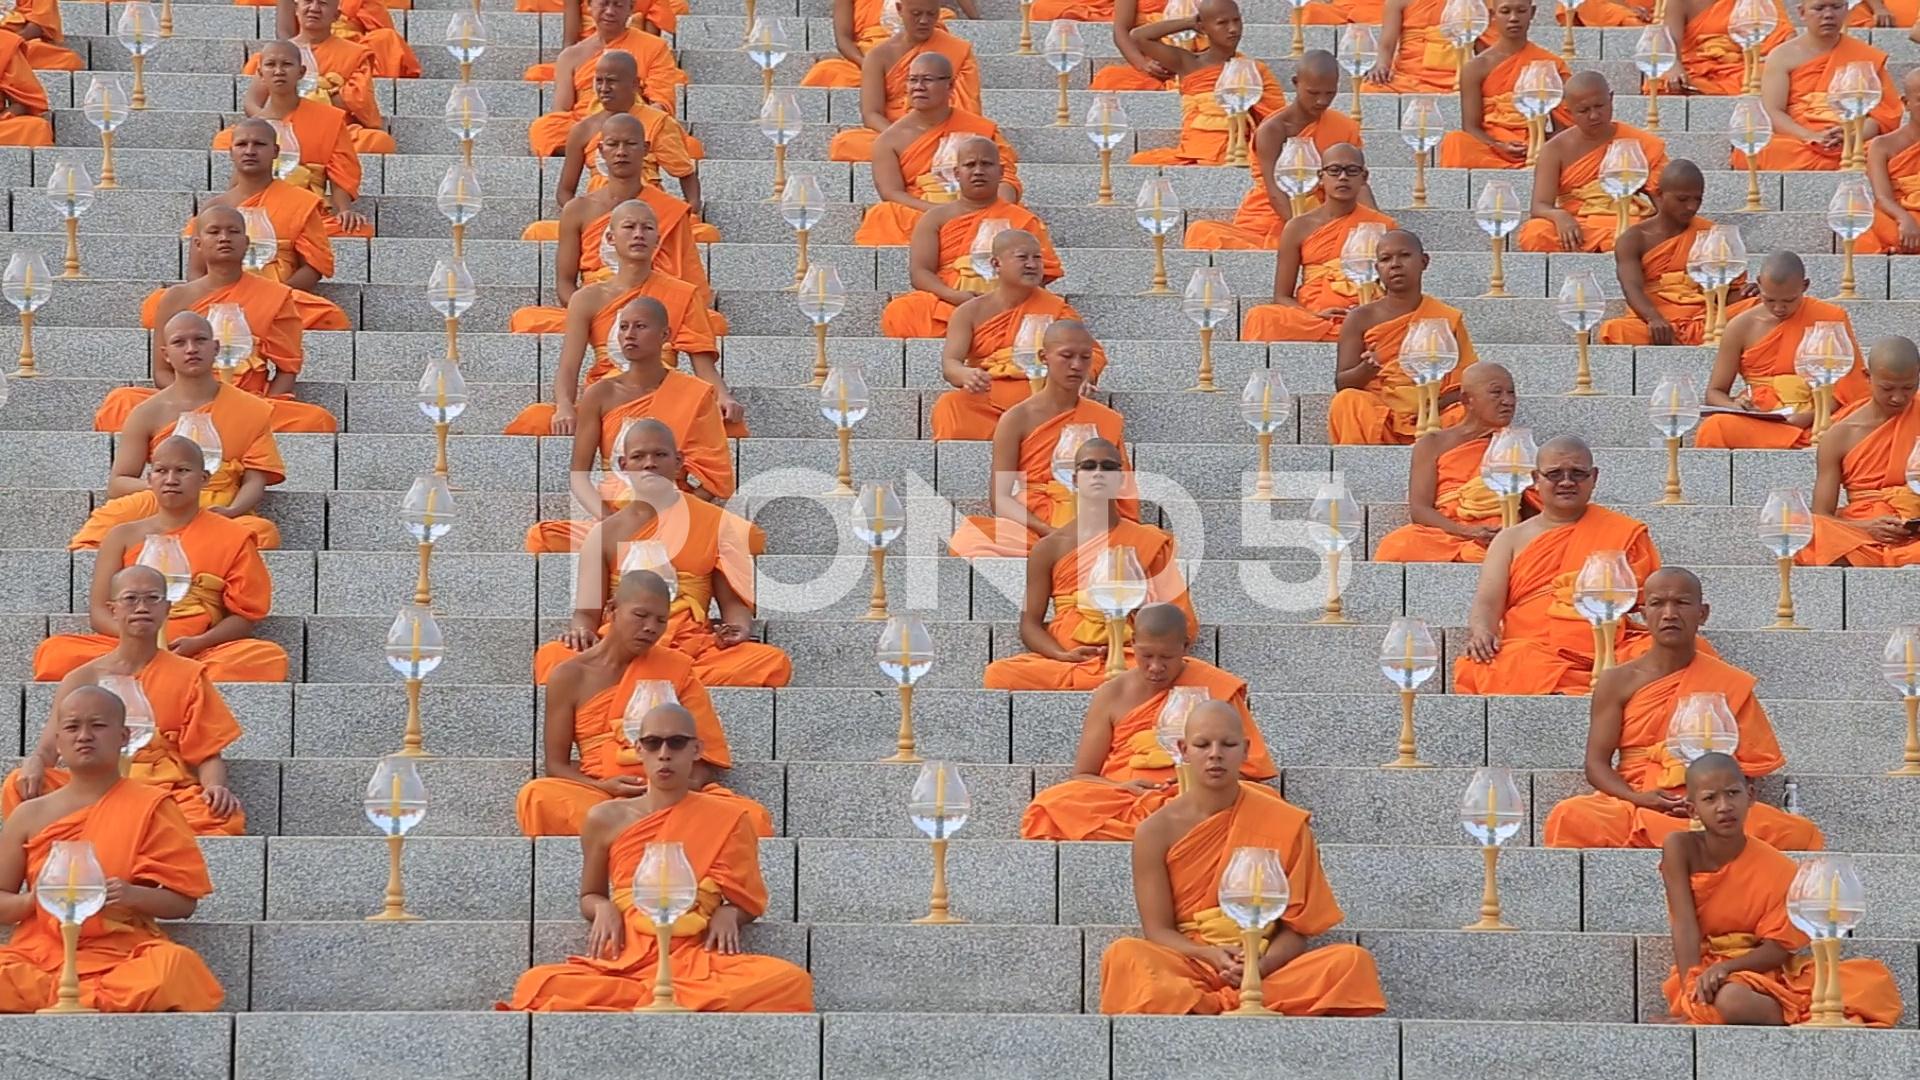 Monks in ceremony Magha Puja Day in Wat Phra Dhammakaya Bangkok 1920x1080